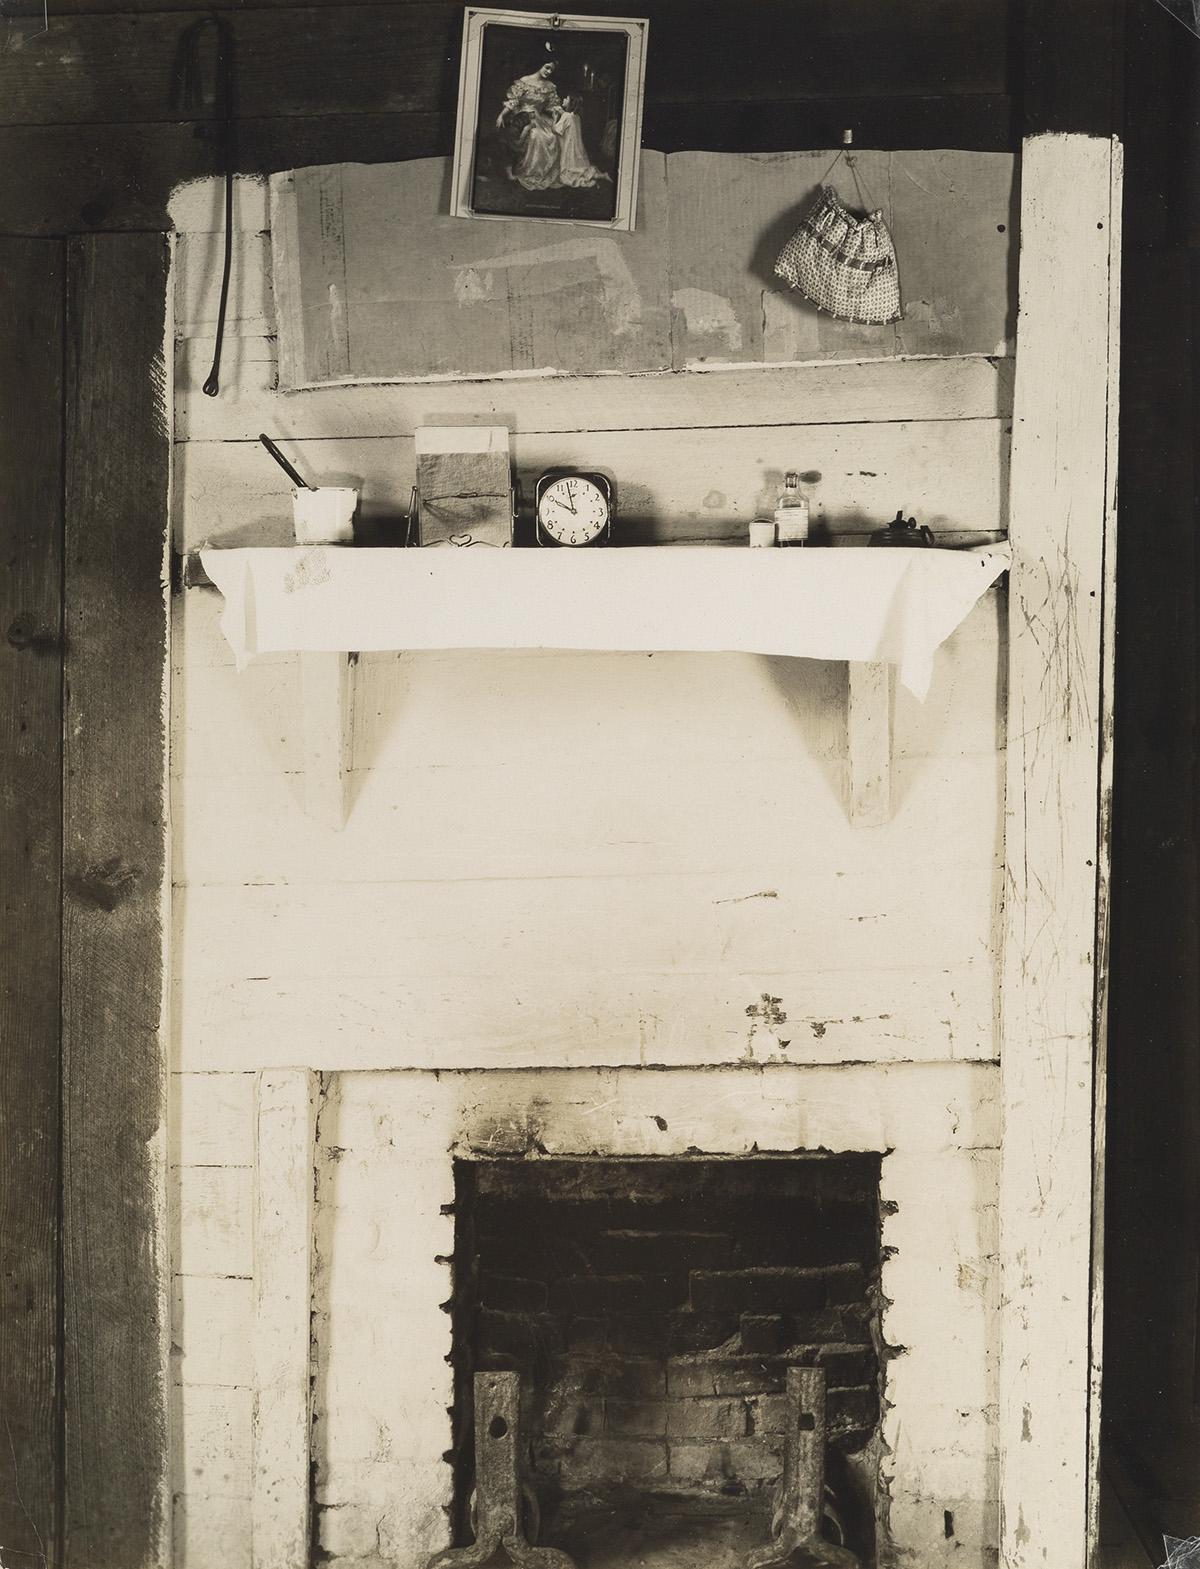 WALKER EVANS (1903-1975) Floyd Burroughs Bedroom, Alabama.